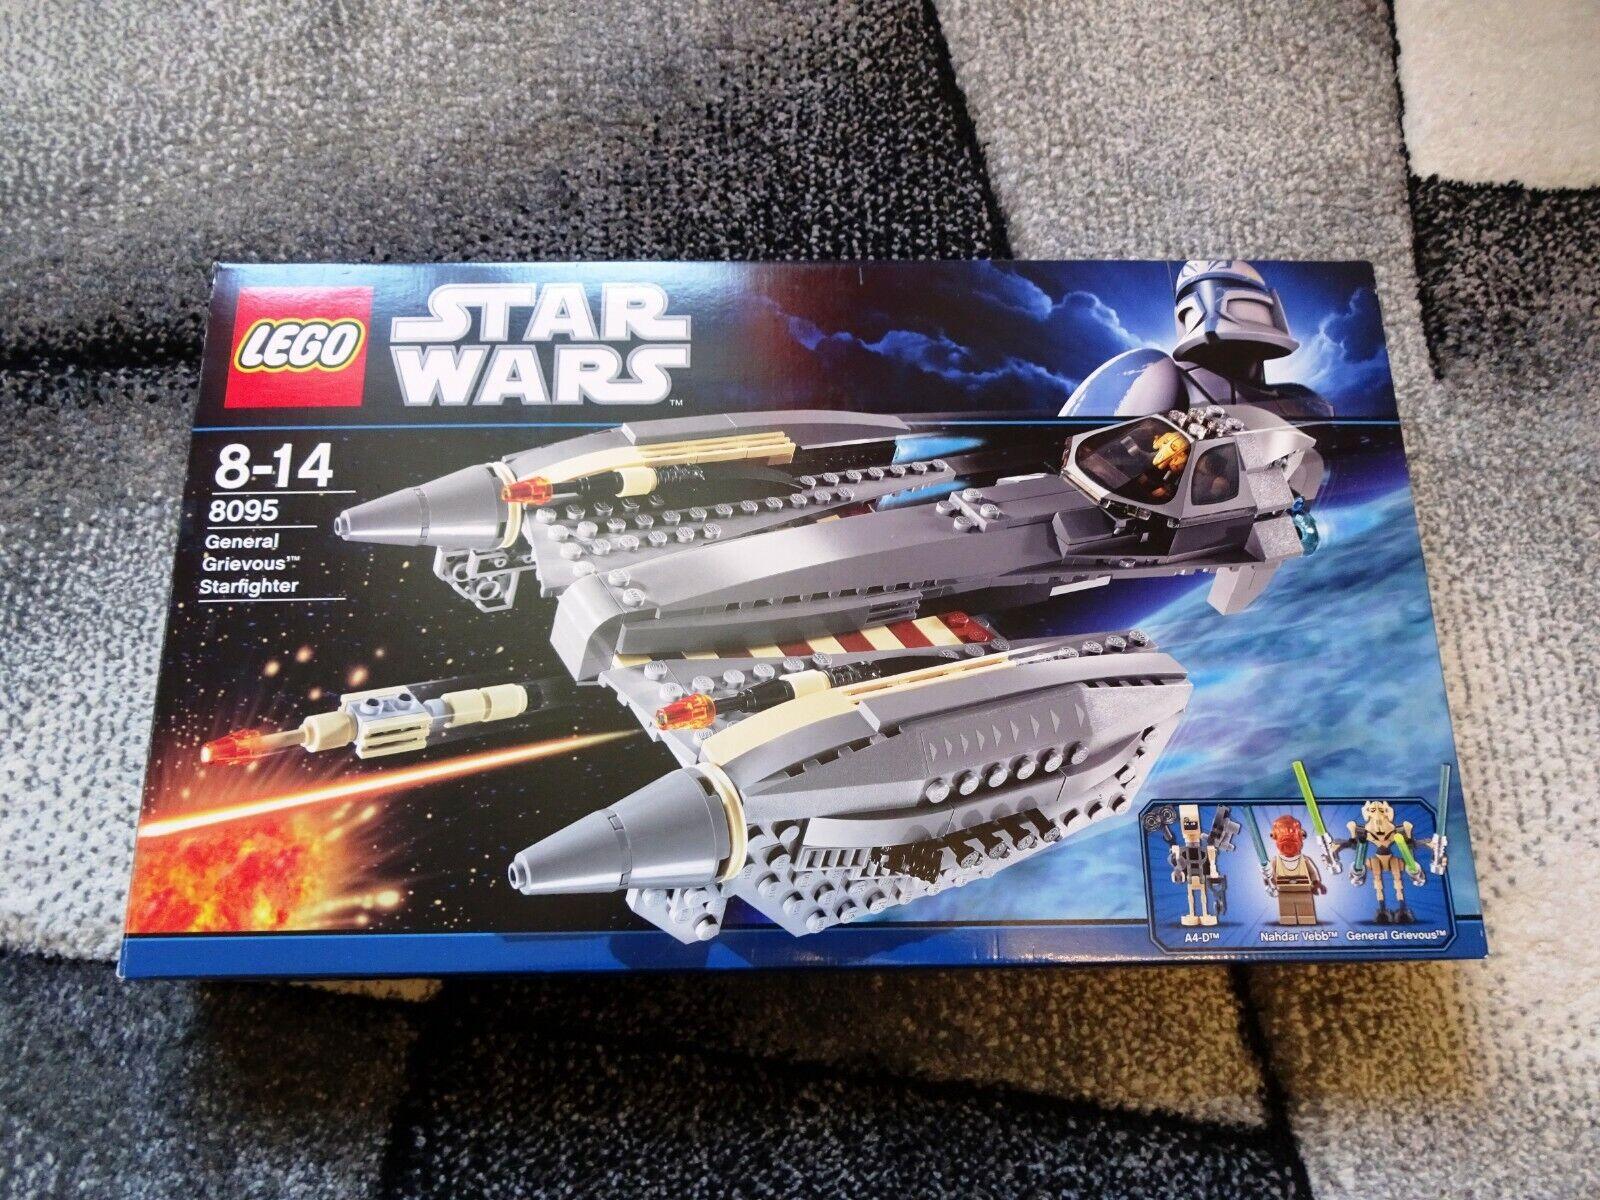 Lego - Star Wars - General Grievous SF (8095) - komplett - sehr guter Zustand